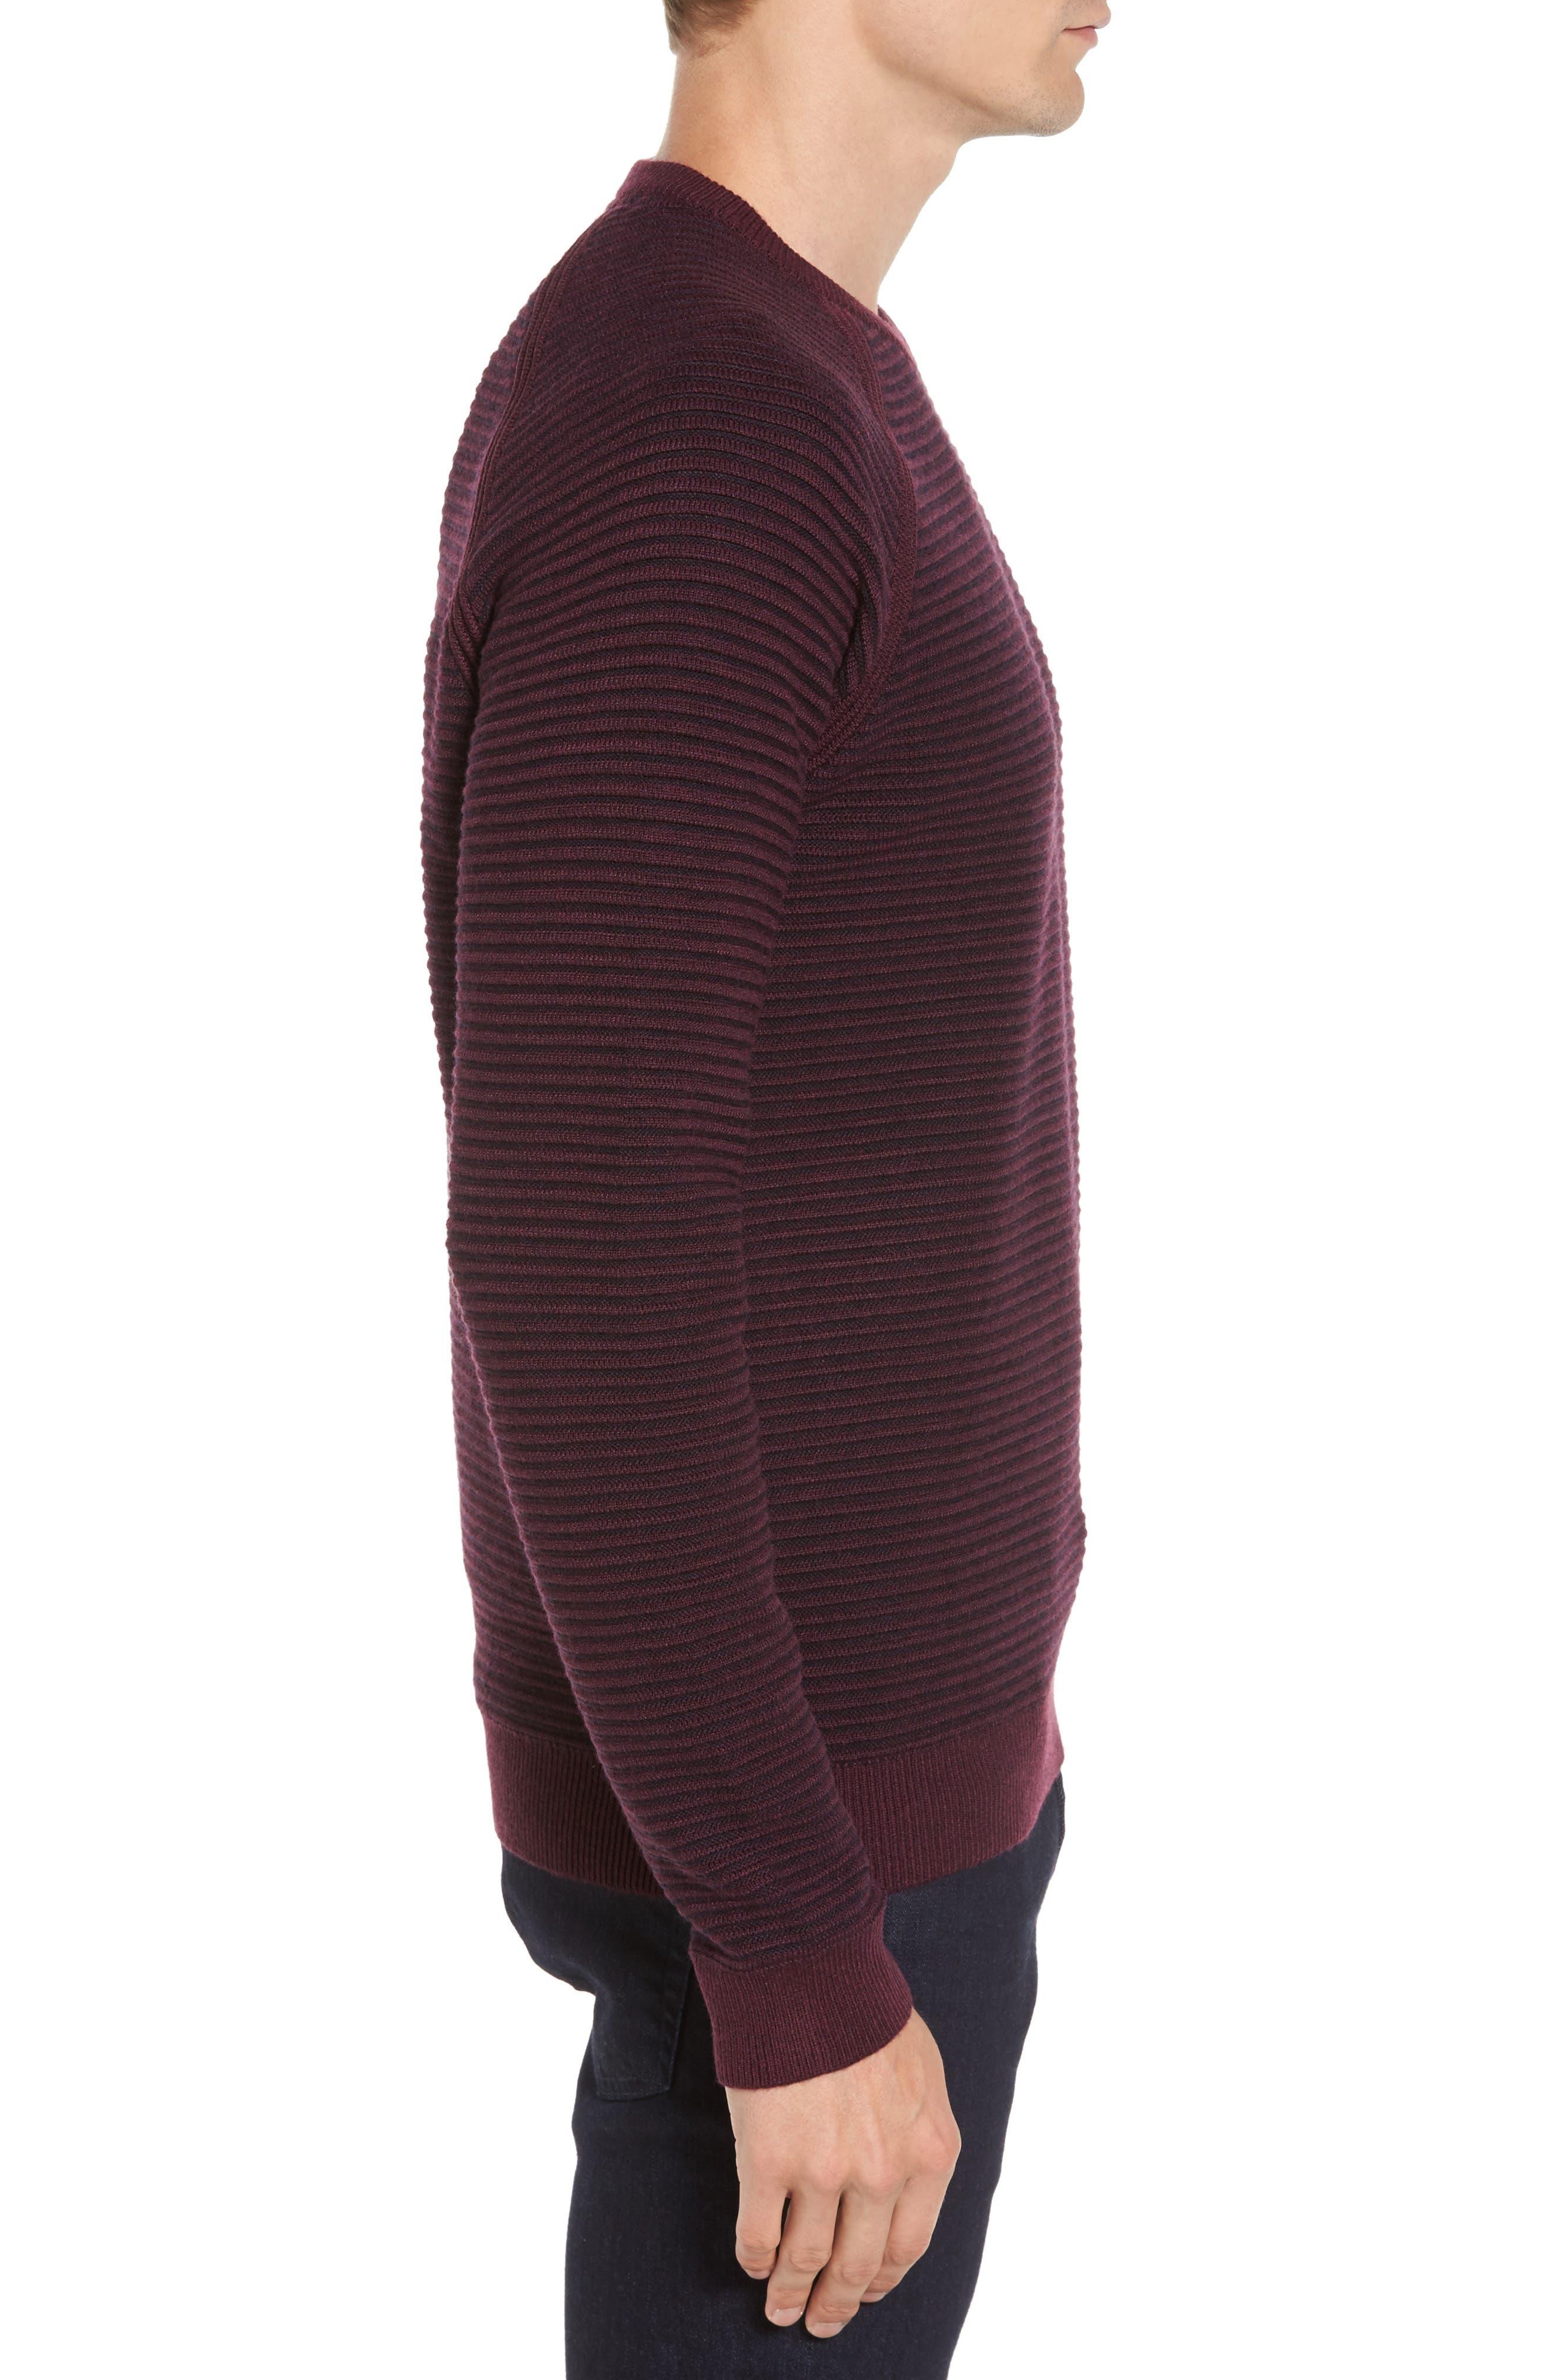 Cashoo Slim Fit Ribbed Sweatshirt,                             Alternate thumbnail 3, color,                             Purple